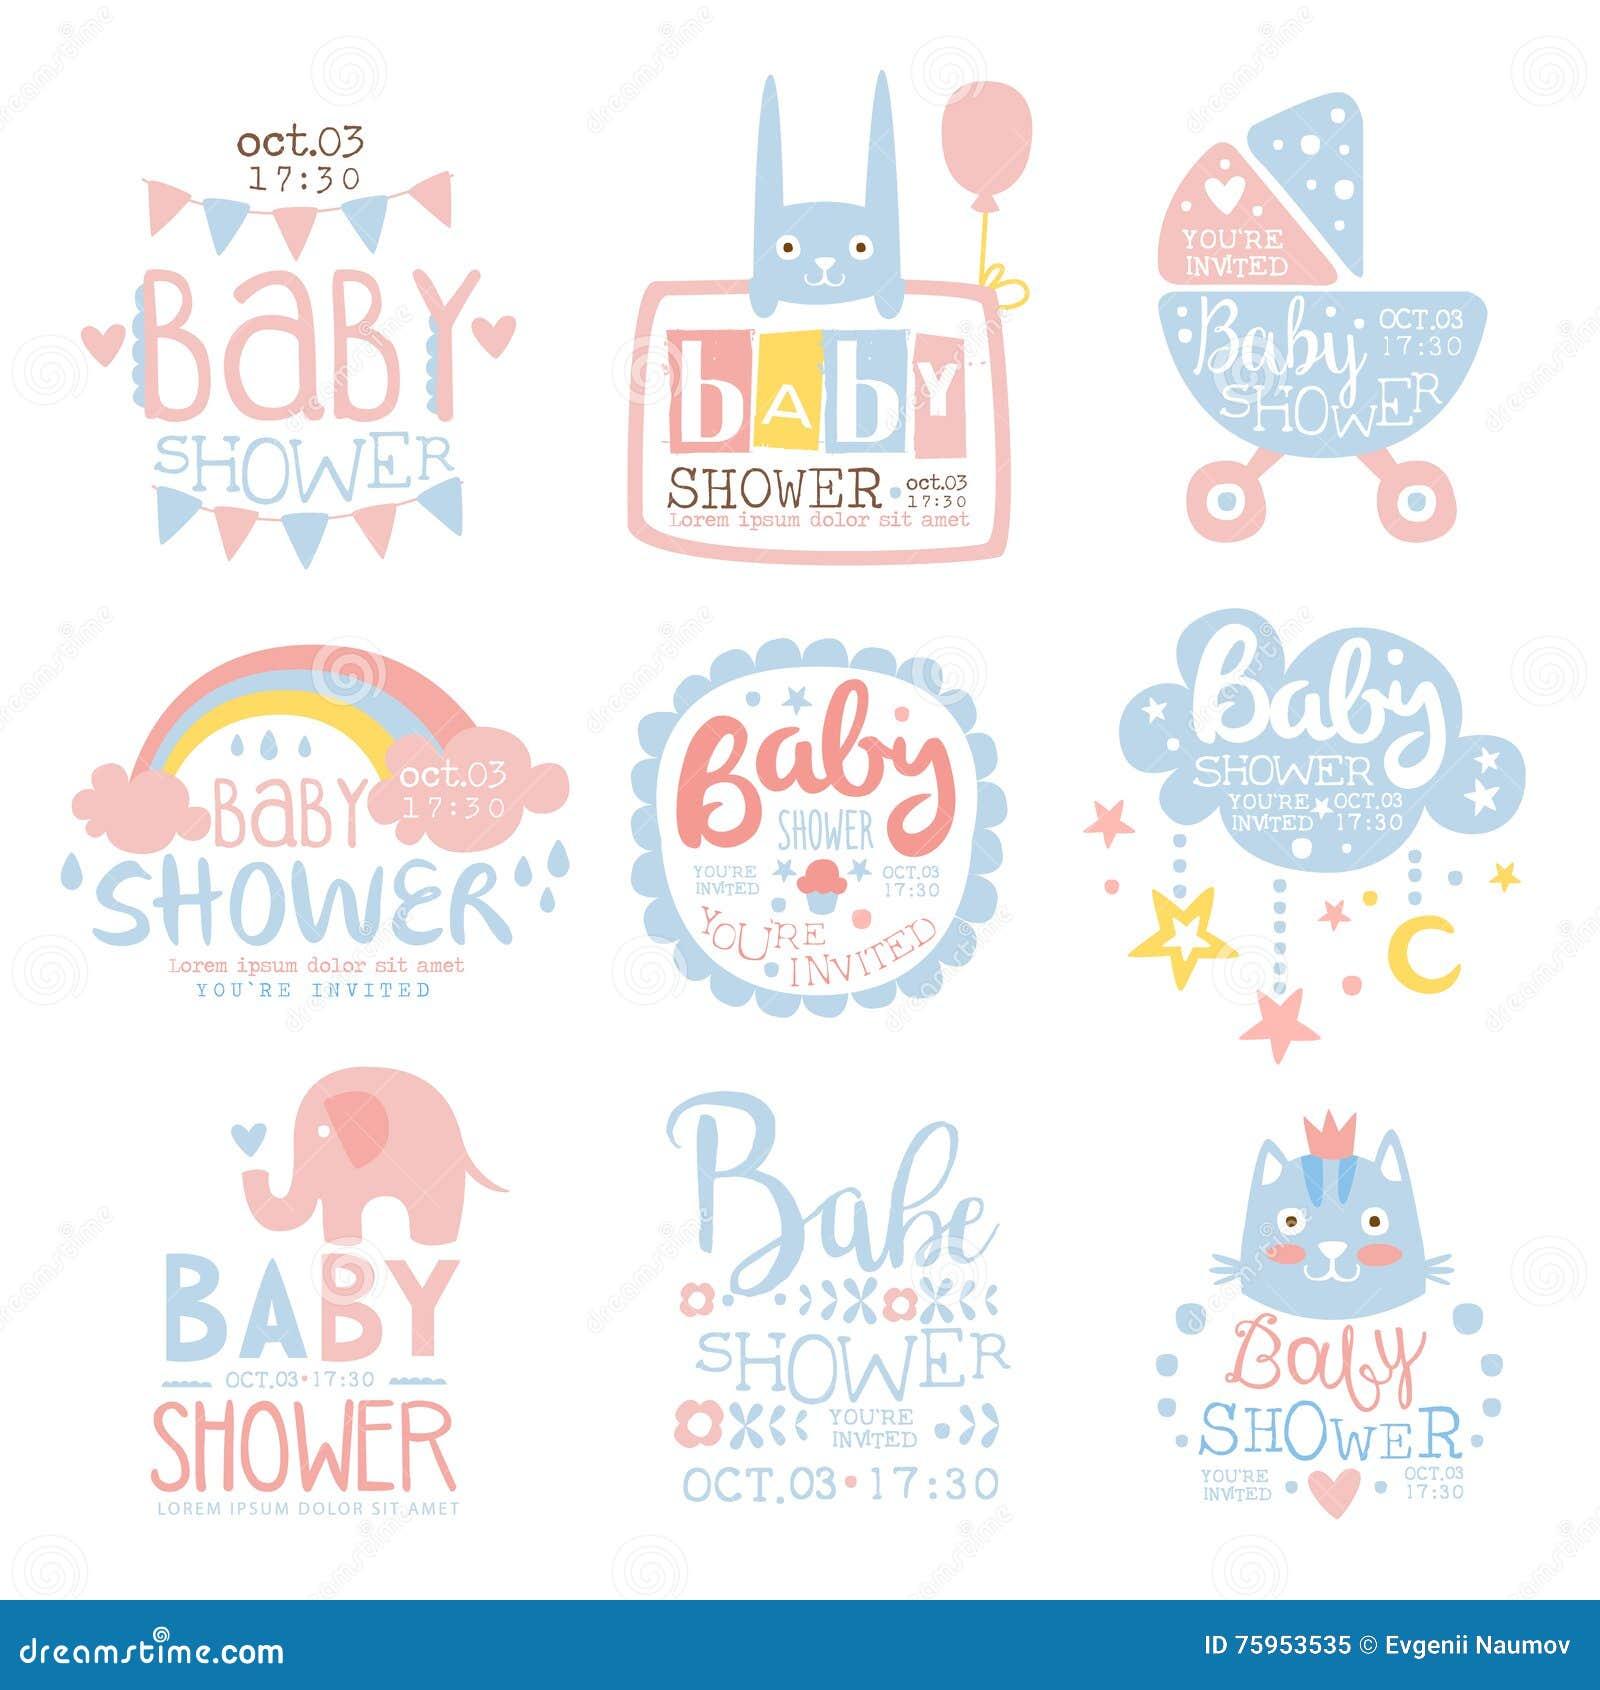 Postcard Baby Shower Invitations – gangcraft.net